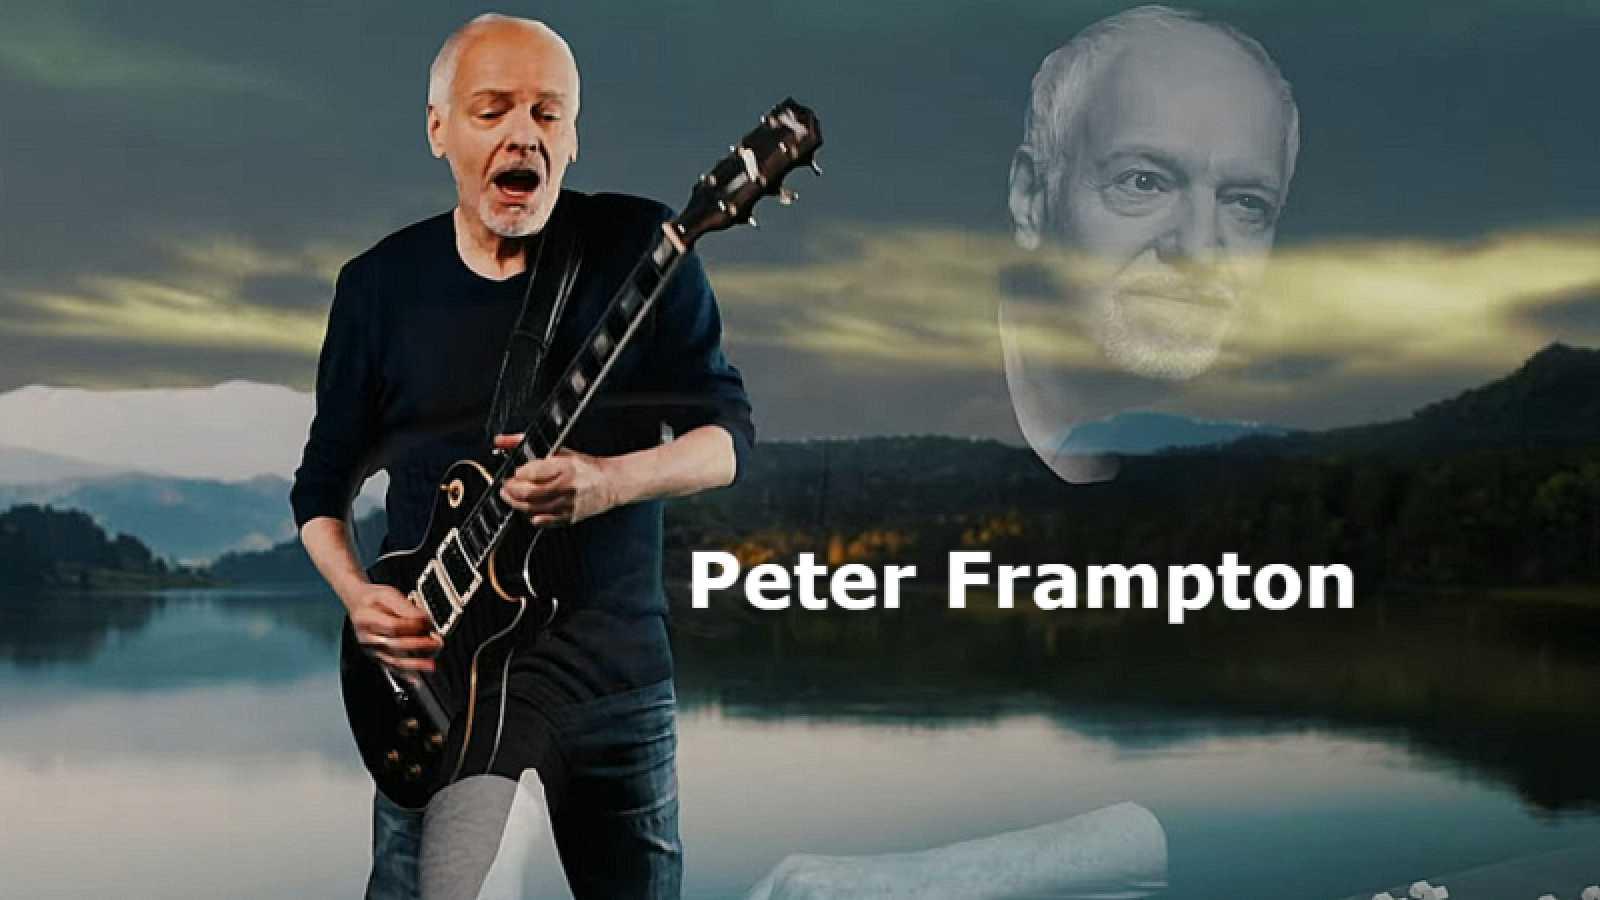 Próxima parada - Long John Baldry, David Gilmour y Bonnie Raitt - 14/05/21 - escuchar ahora